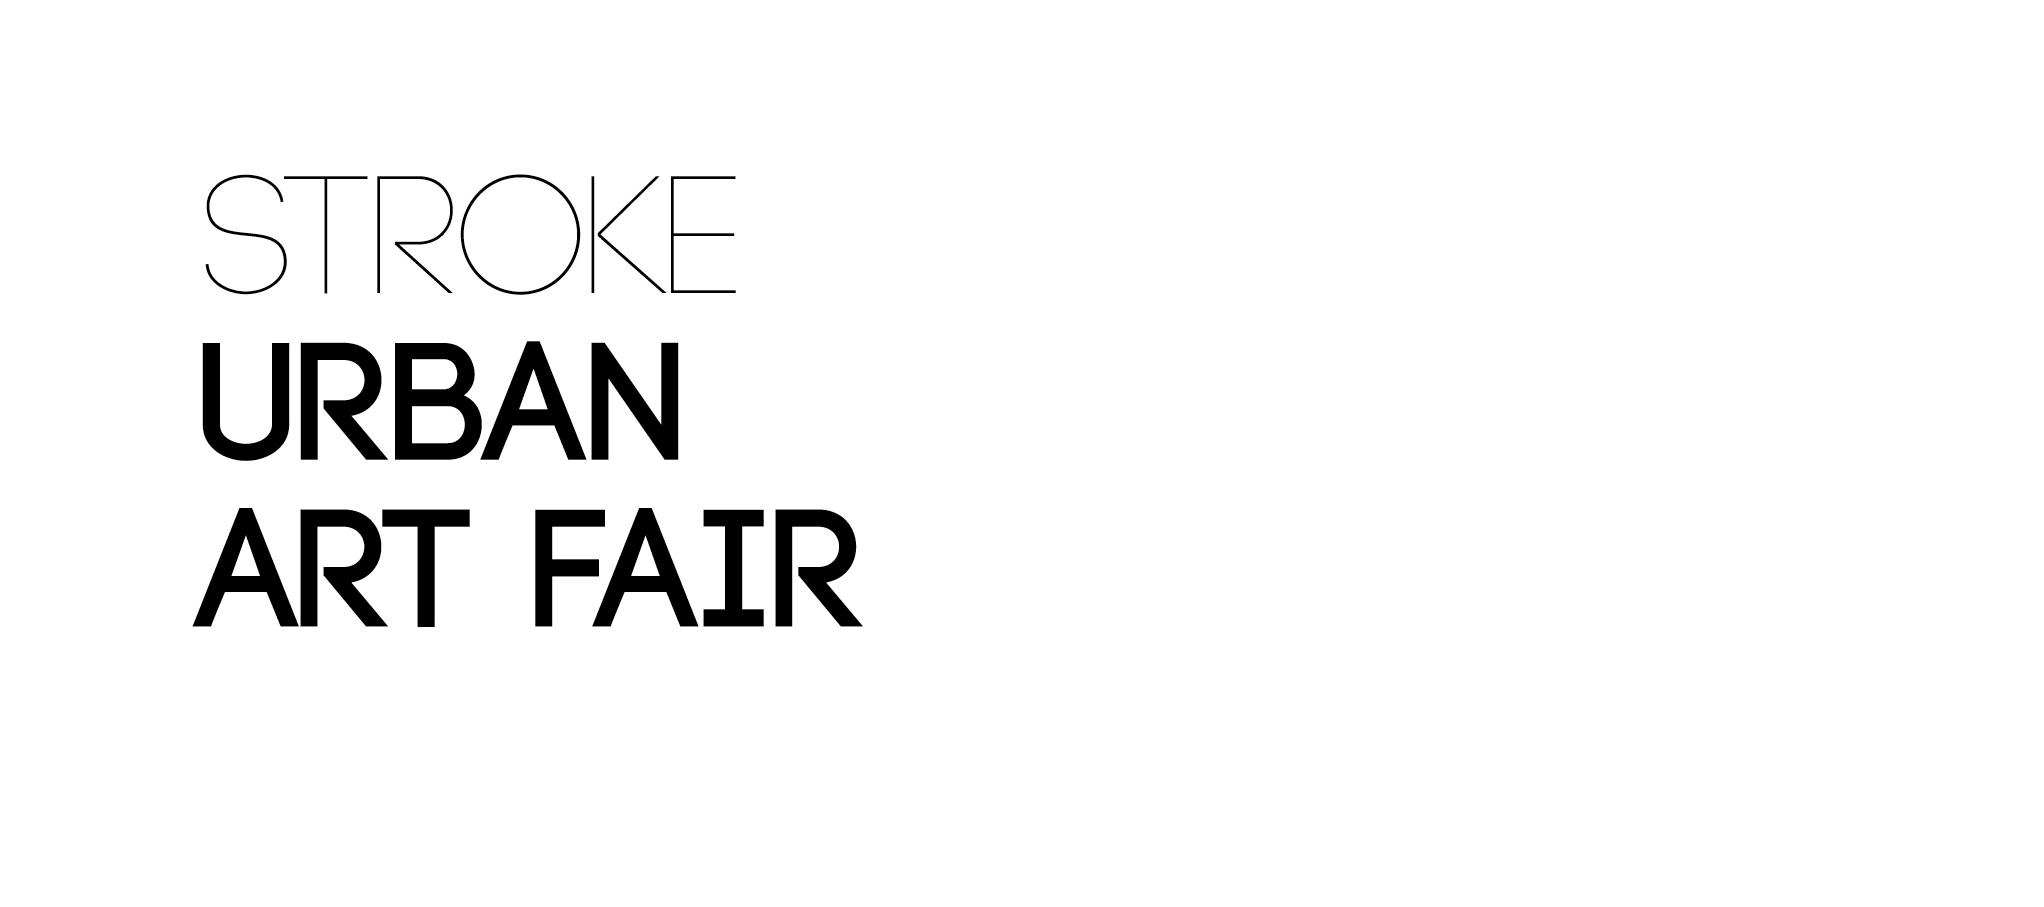 Ab heute: Stroke Urban Art Fair in München